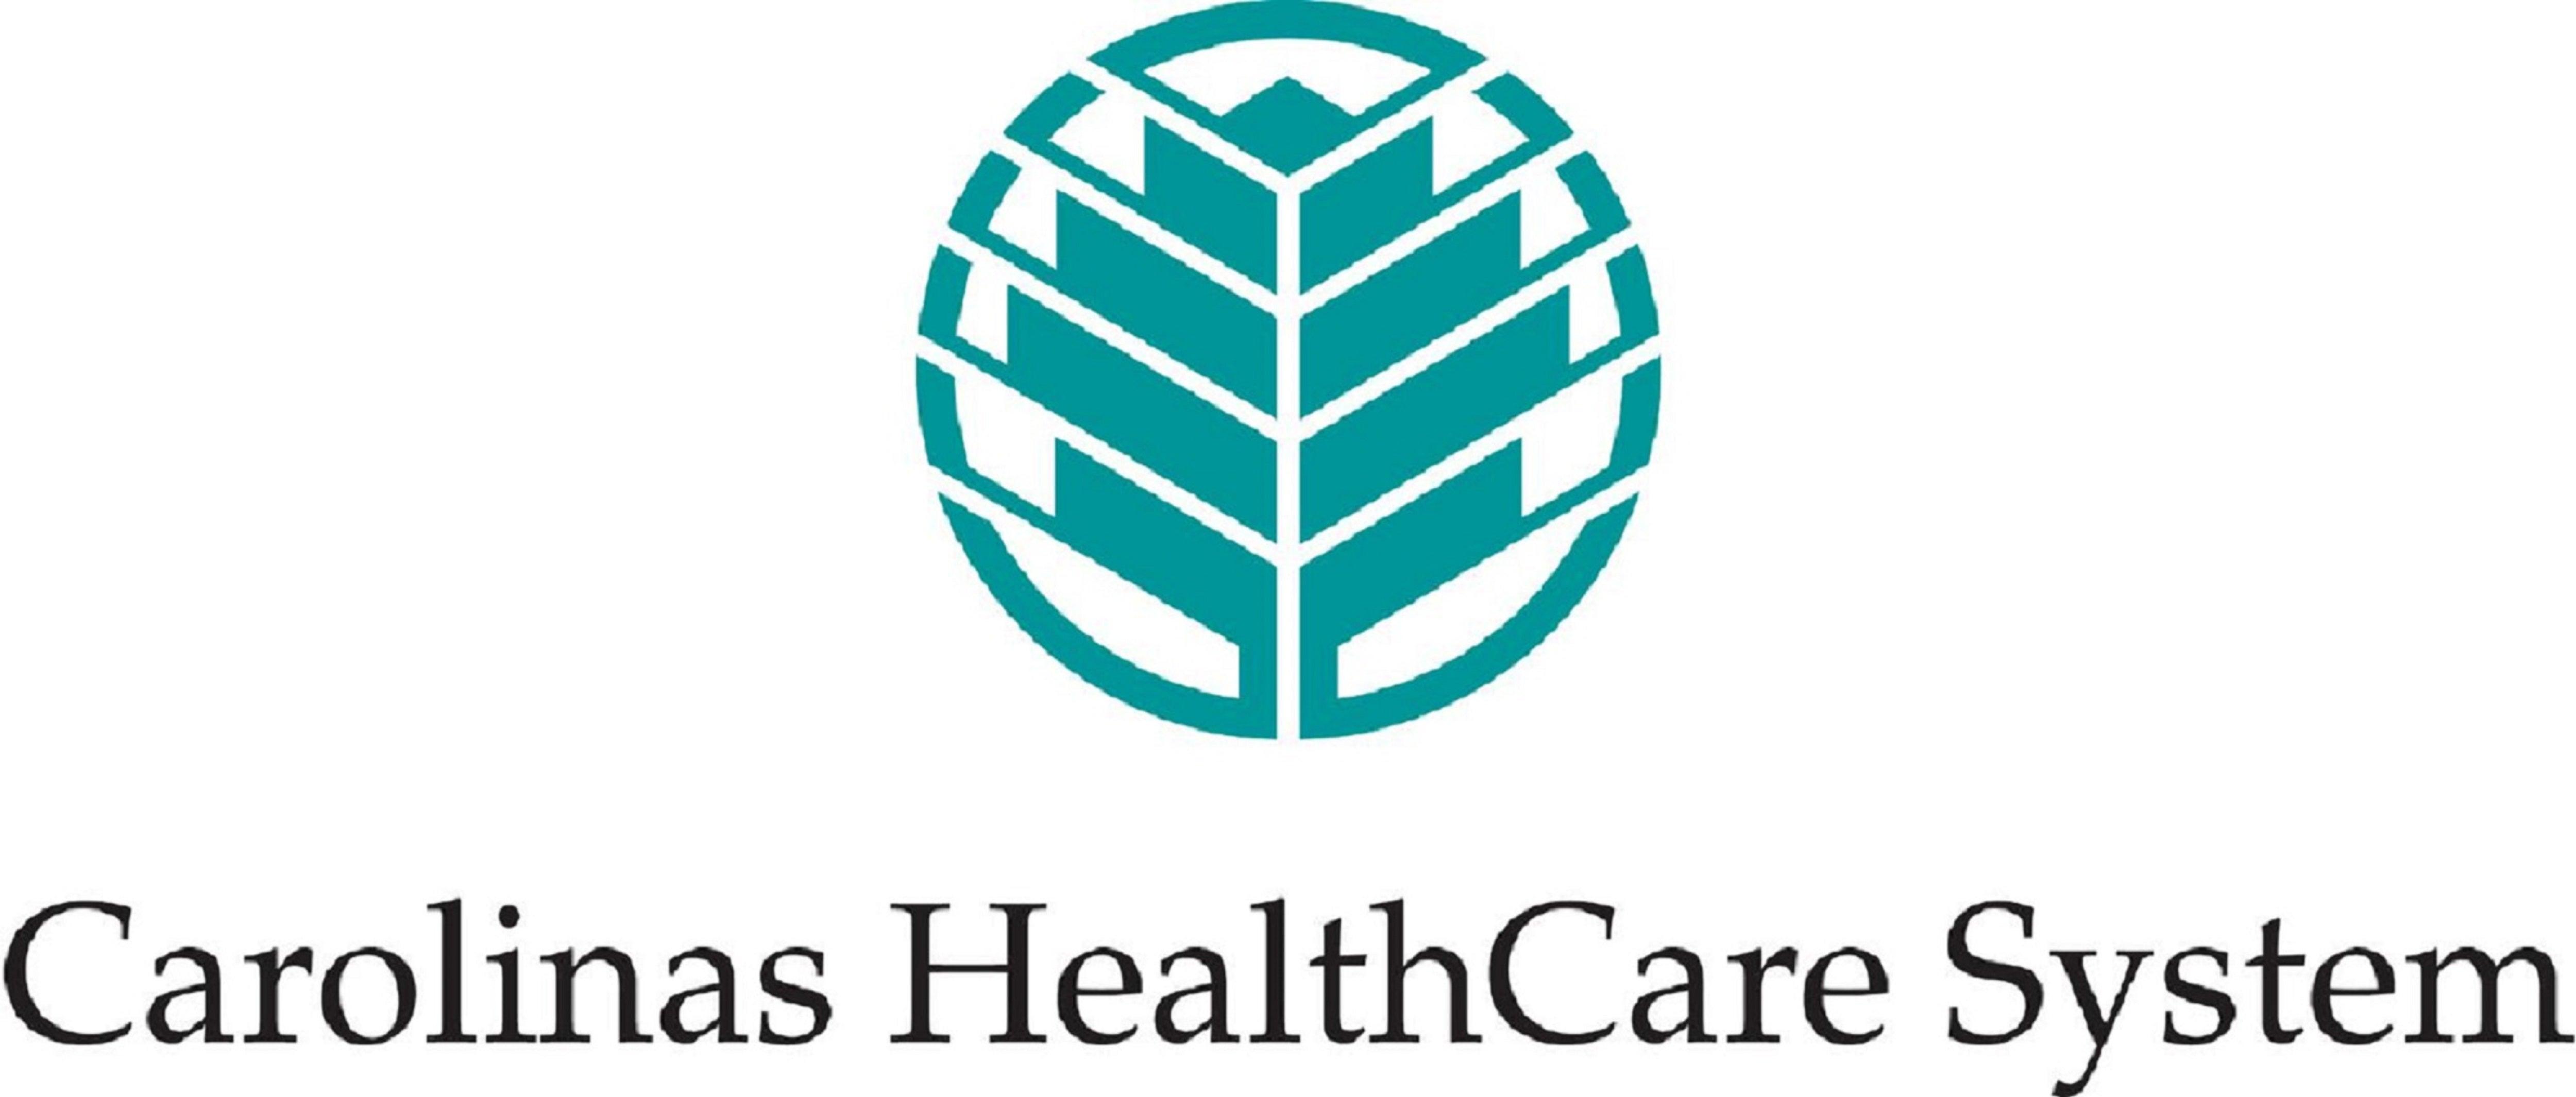 CHS-Vertical-Logo-4C.jpg